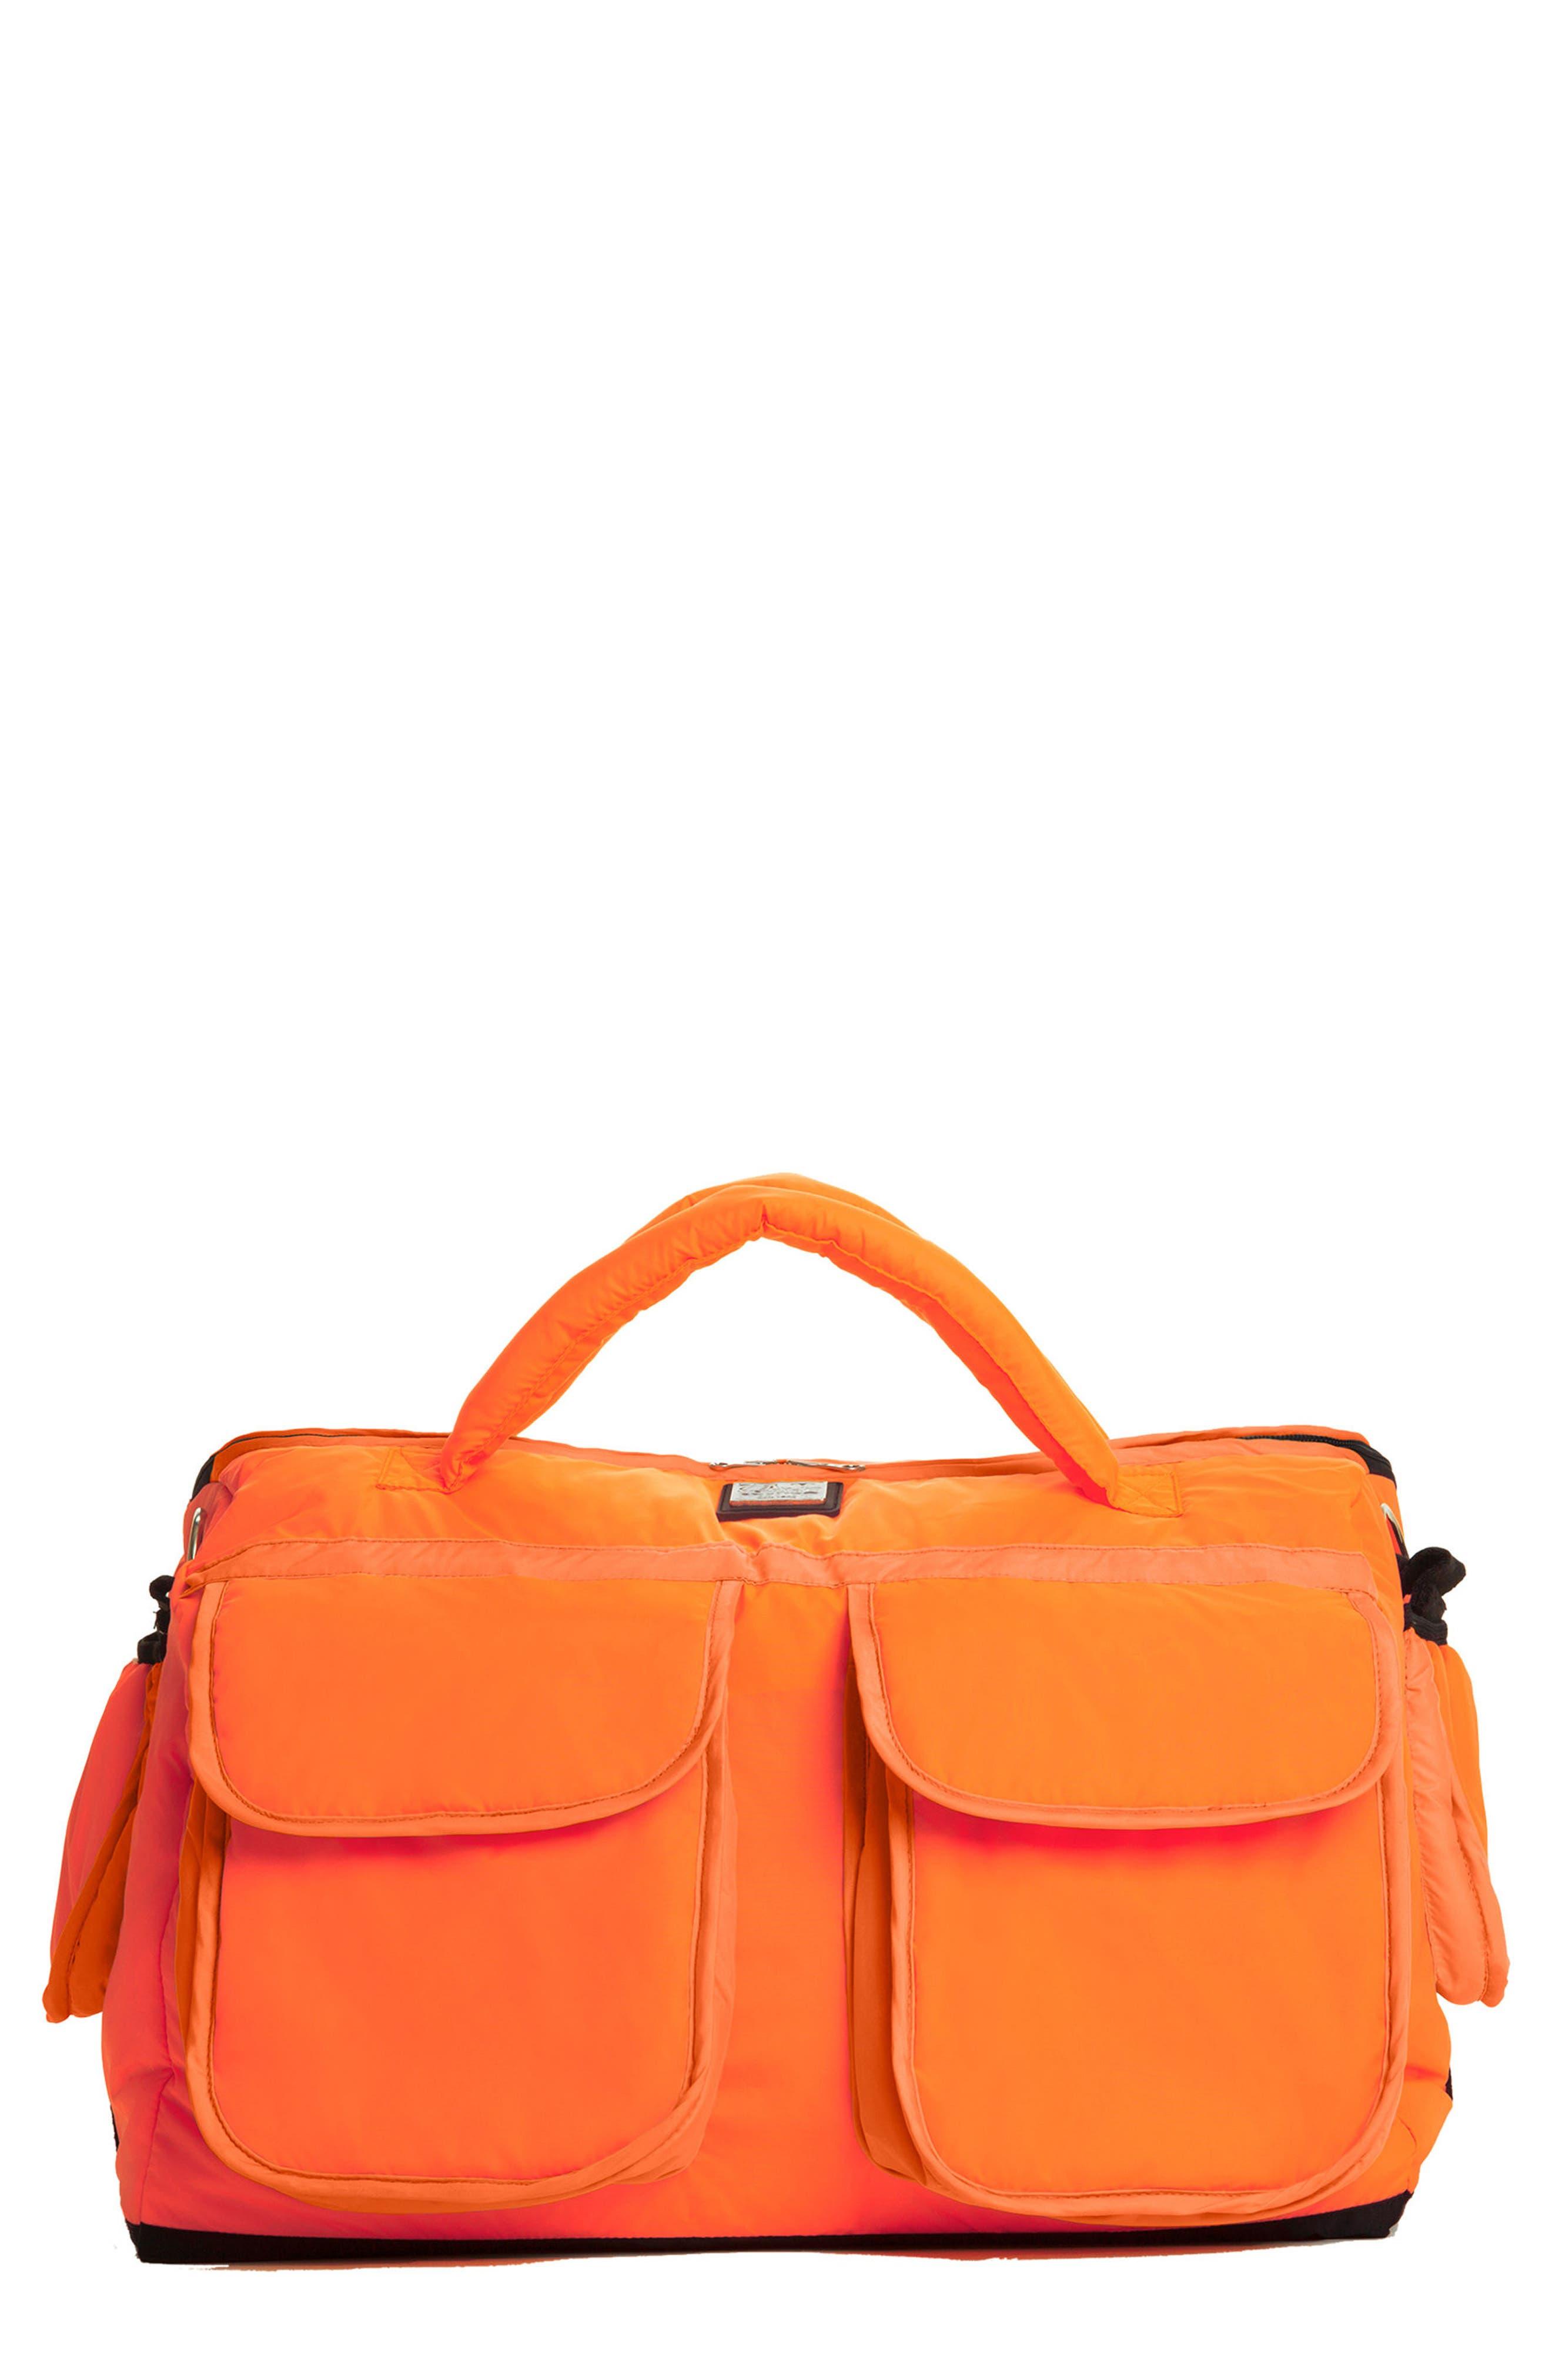 'Voyage' Diaper Bag,                             Main thumbnail 1, color,                             Neon Orange